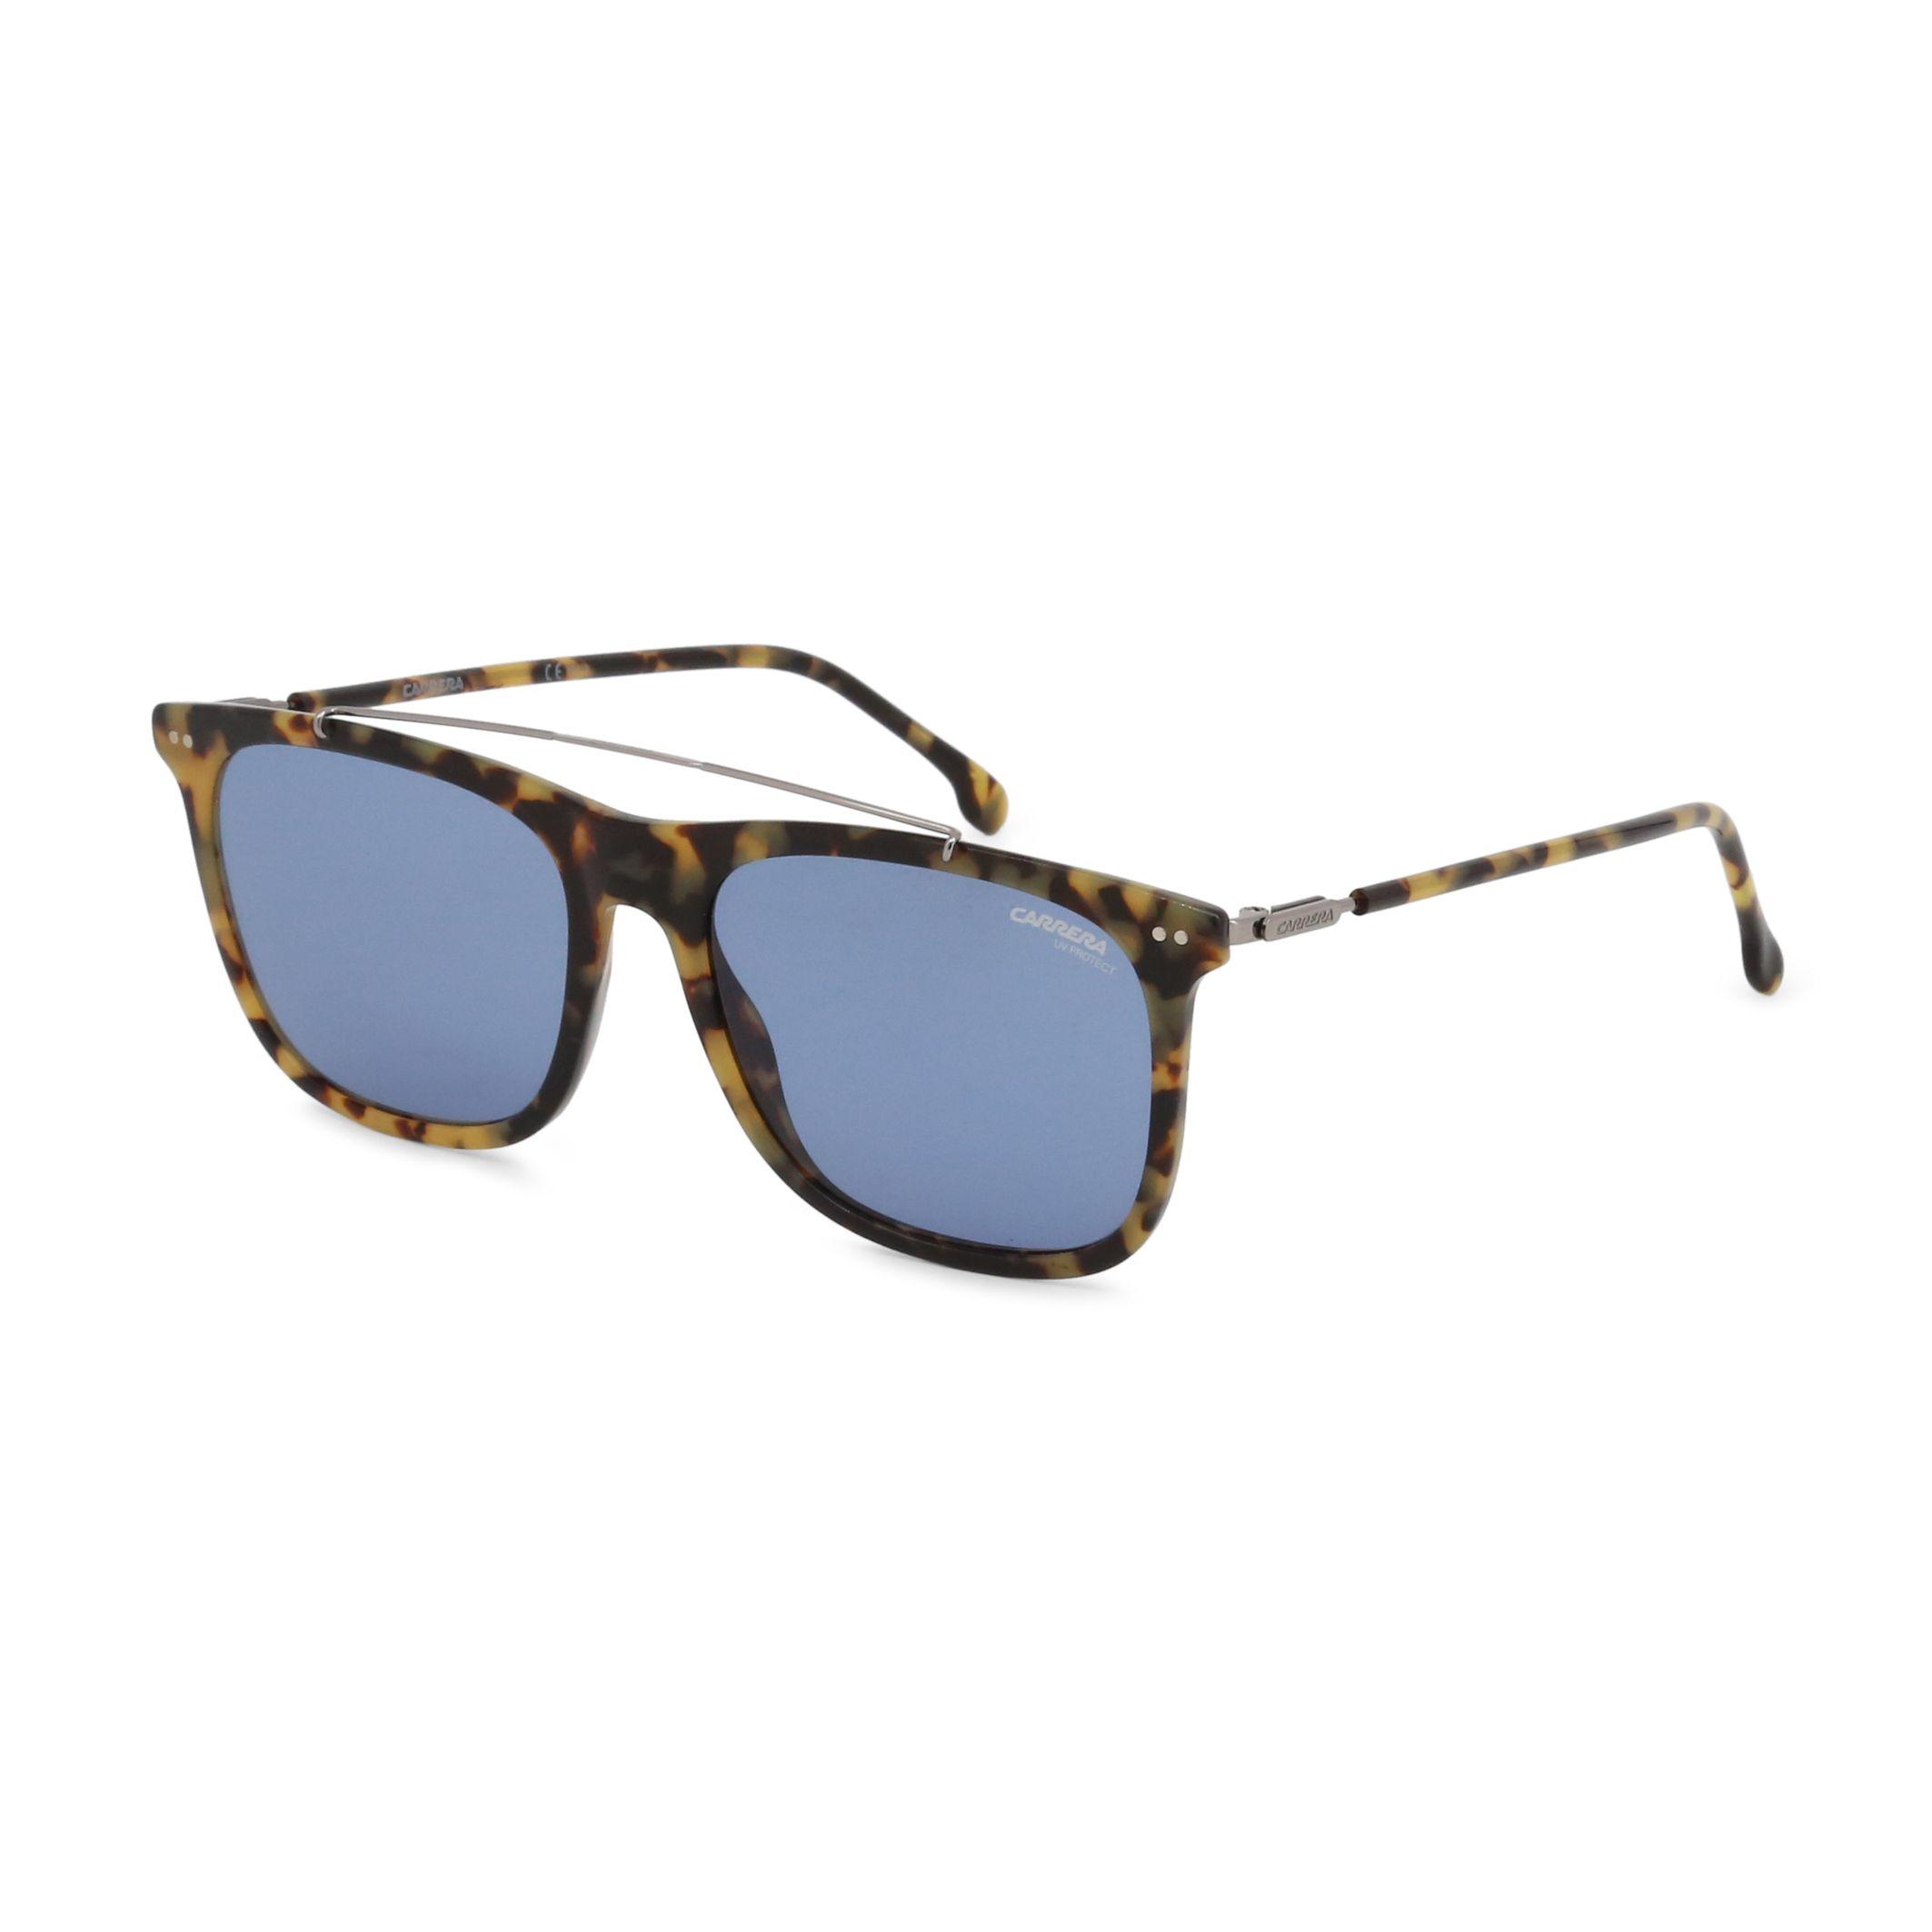 Carrera Unisexs Sunglasses